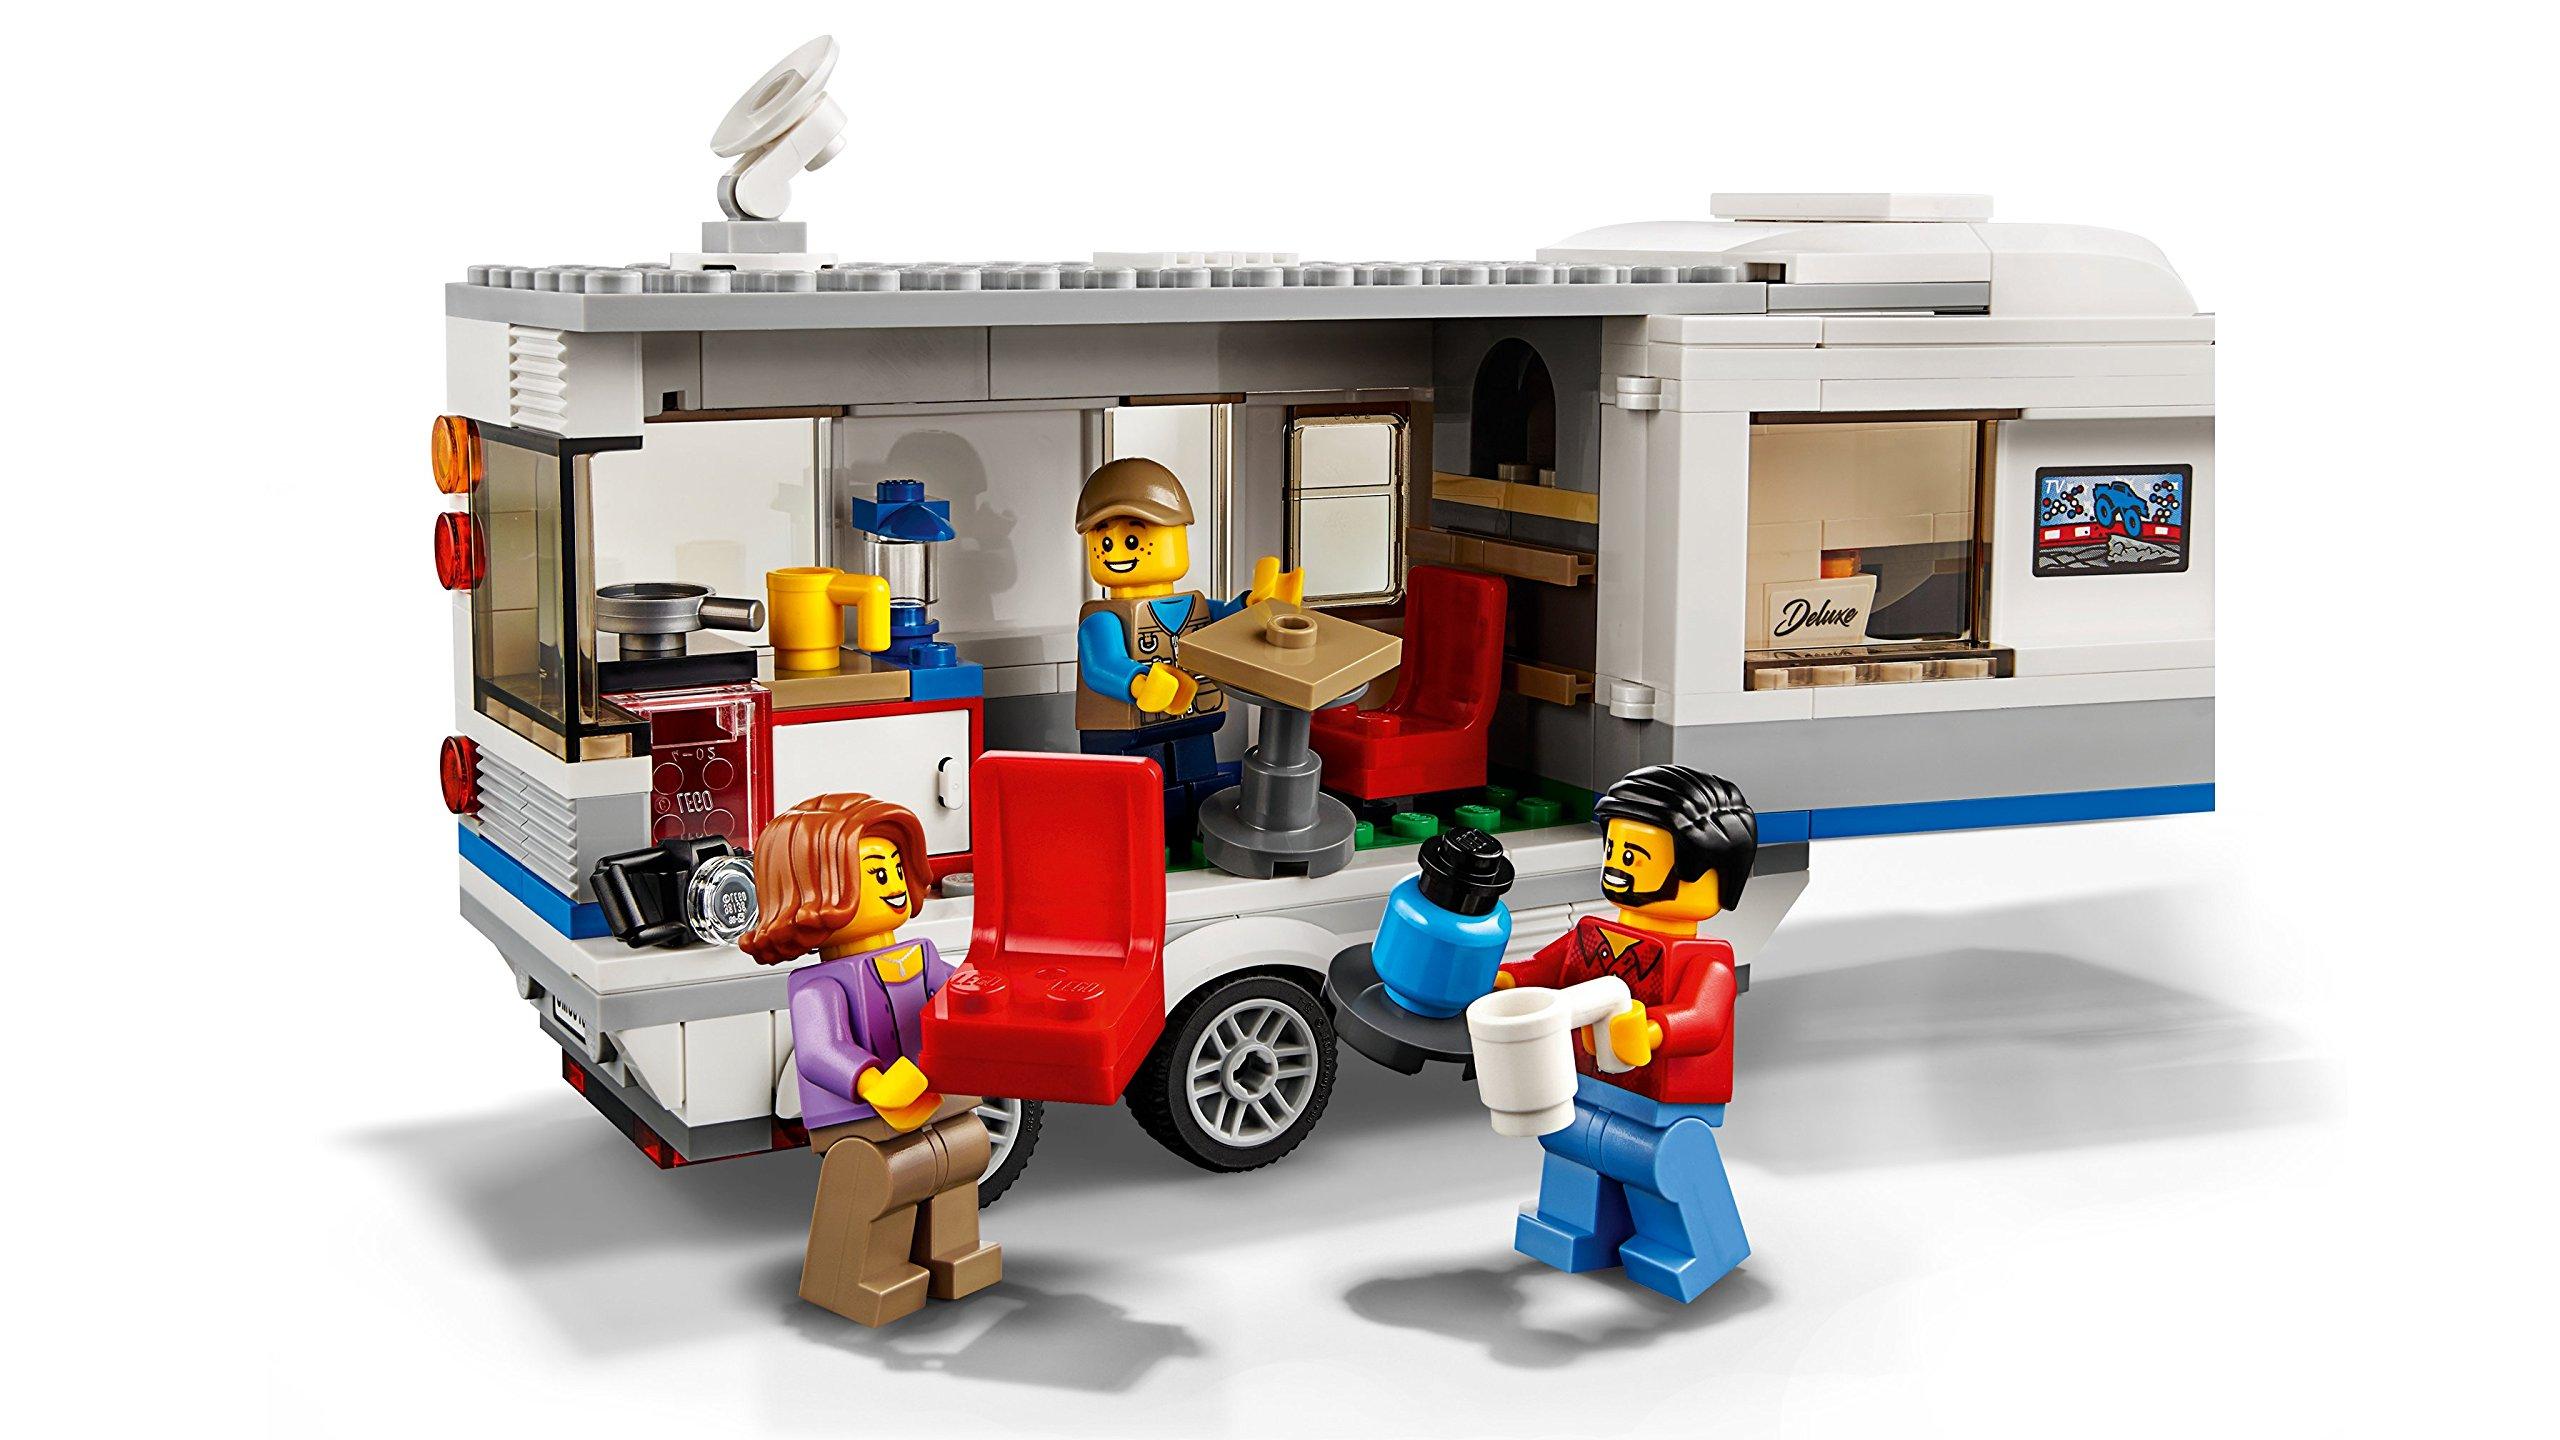 LEGO- City Pickup e Caravan, Multicolore, 60182 4 spesavip